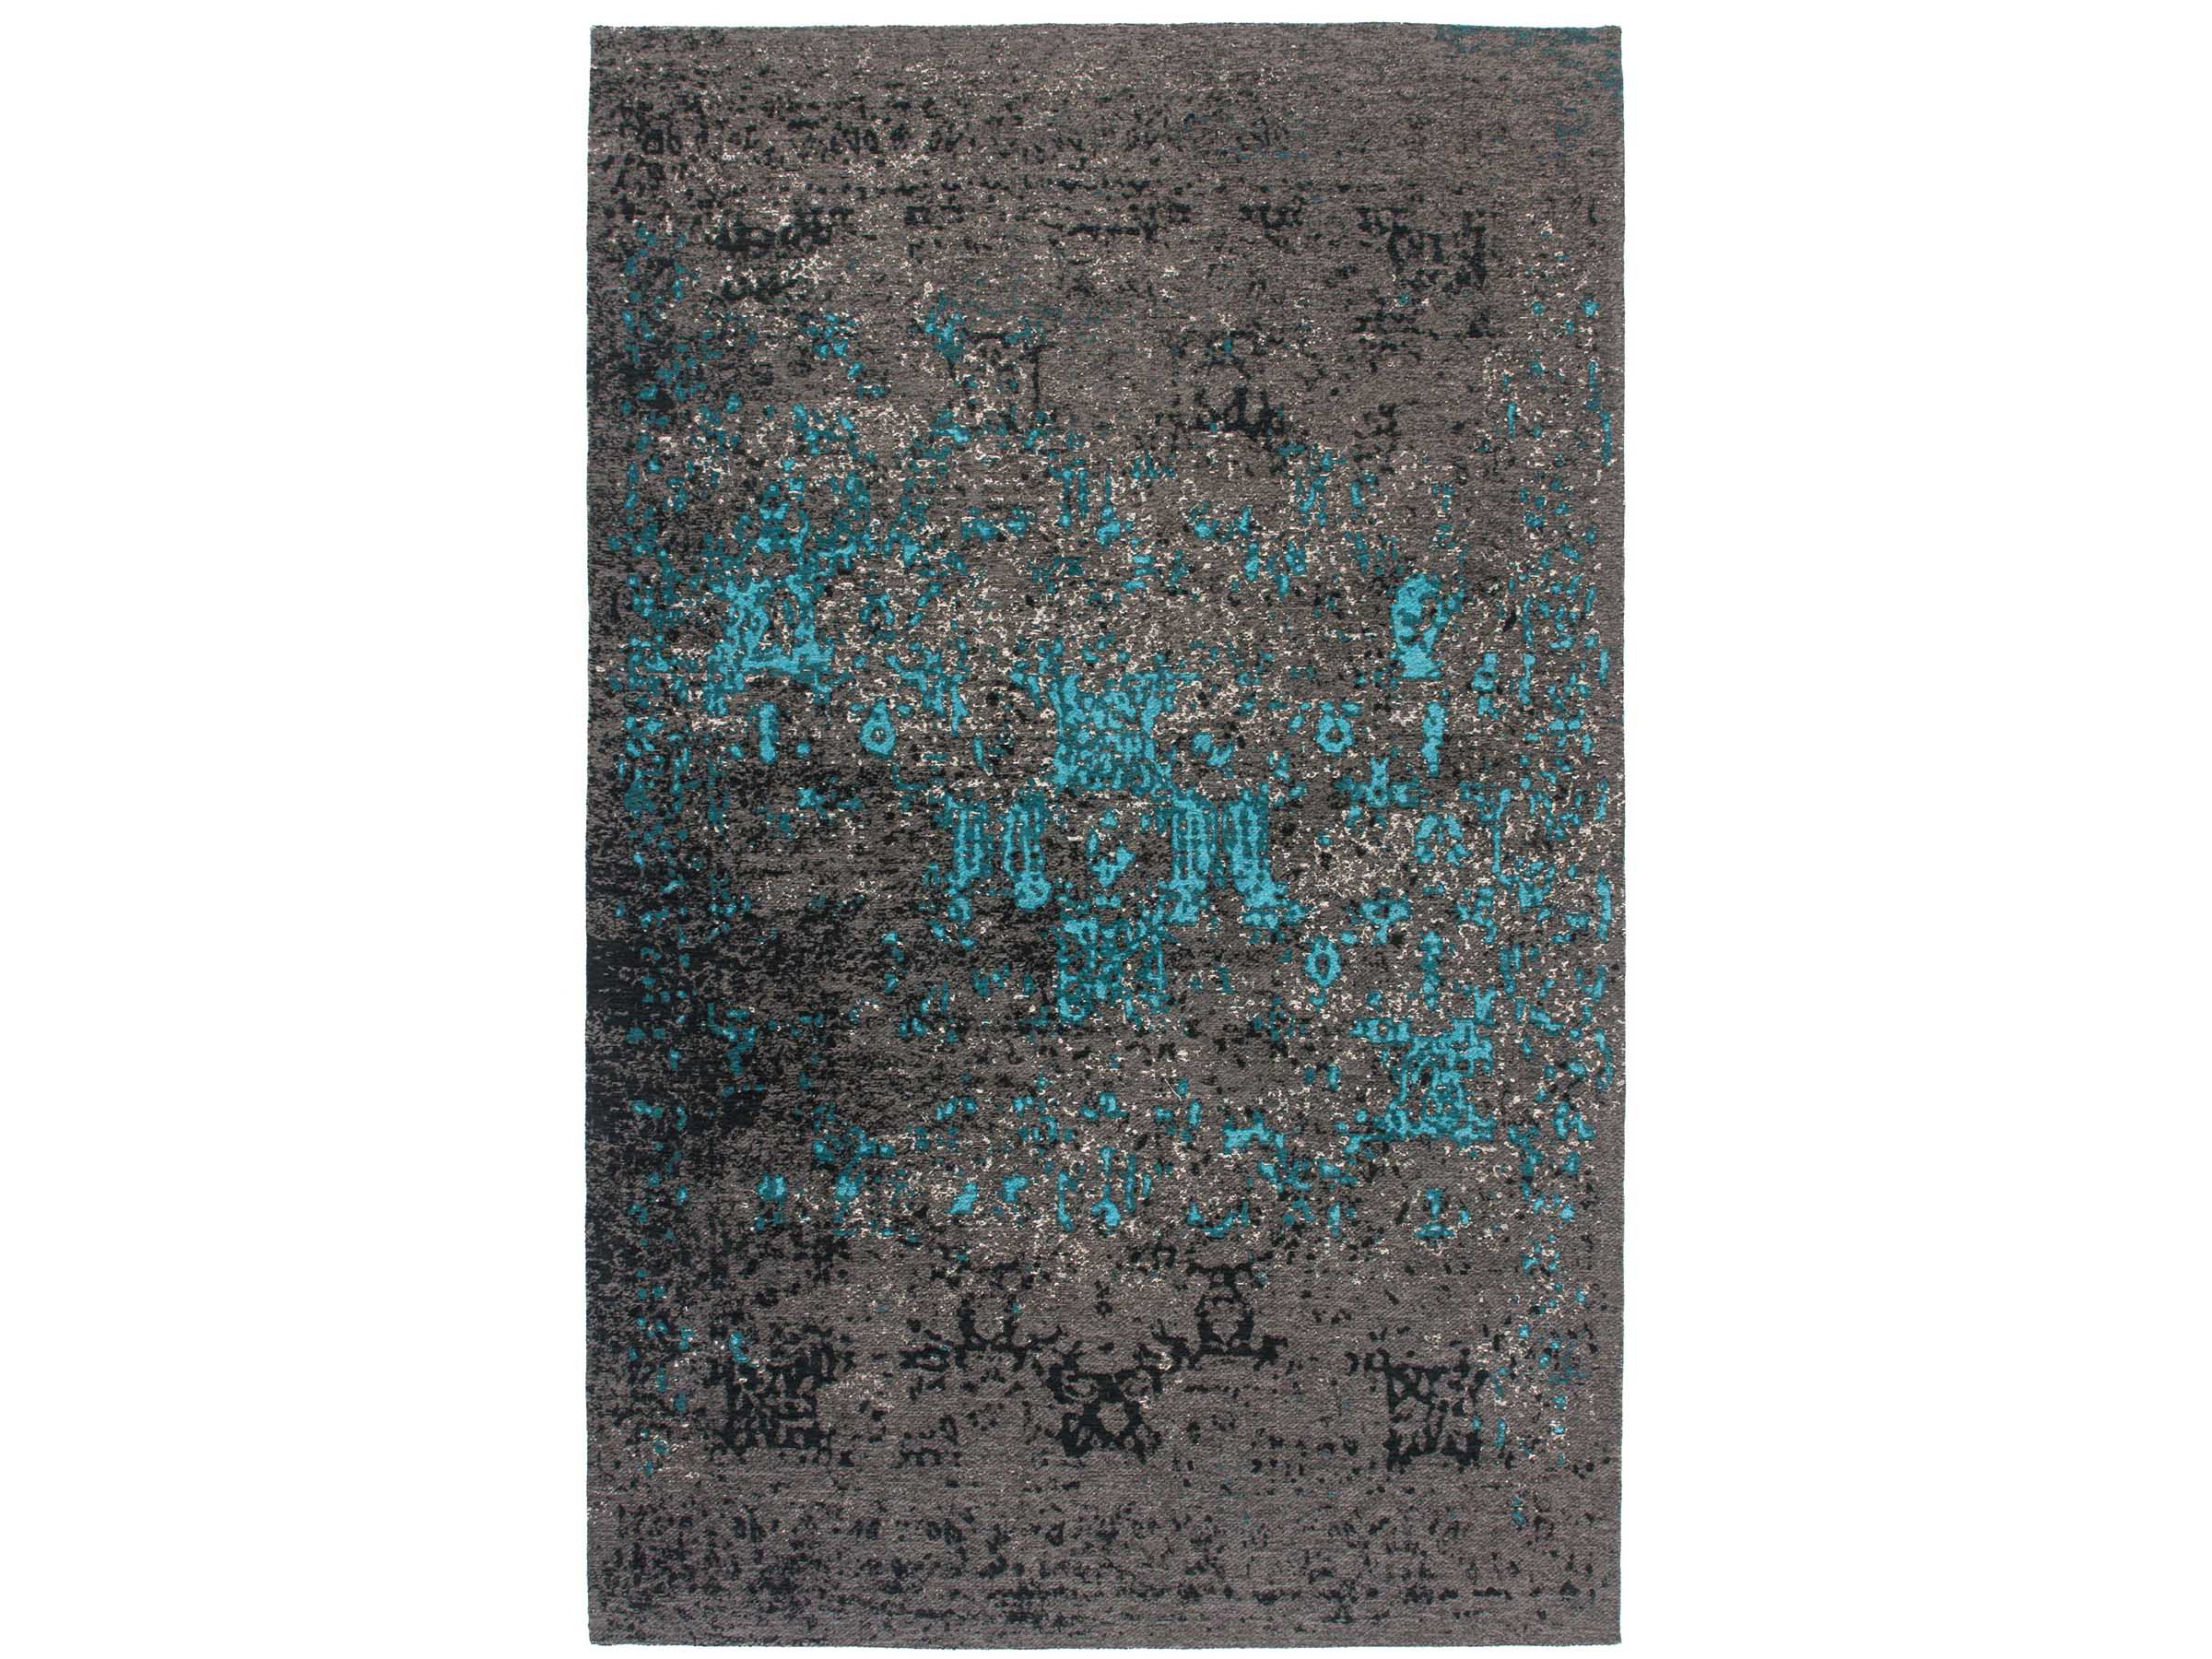 Blauw Perzisch Tapijt : Blauw perzisch vloerkleed kopen perzische kleden